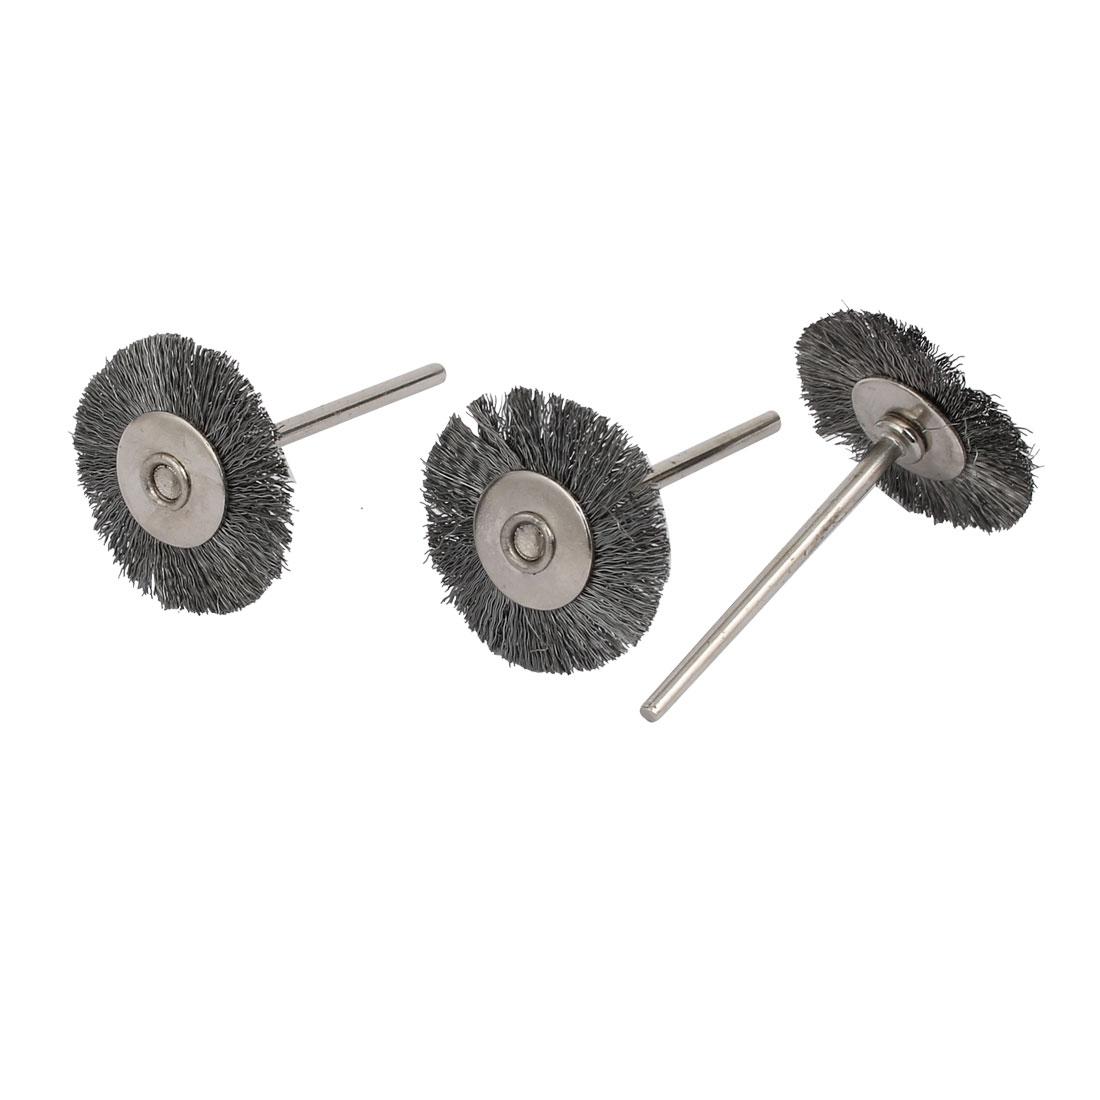 25mm Dia 2.35mm Shank T Shaped Steel Wire Wheel Brush Polishing Rotary Tool 3pcs